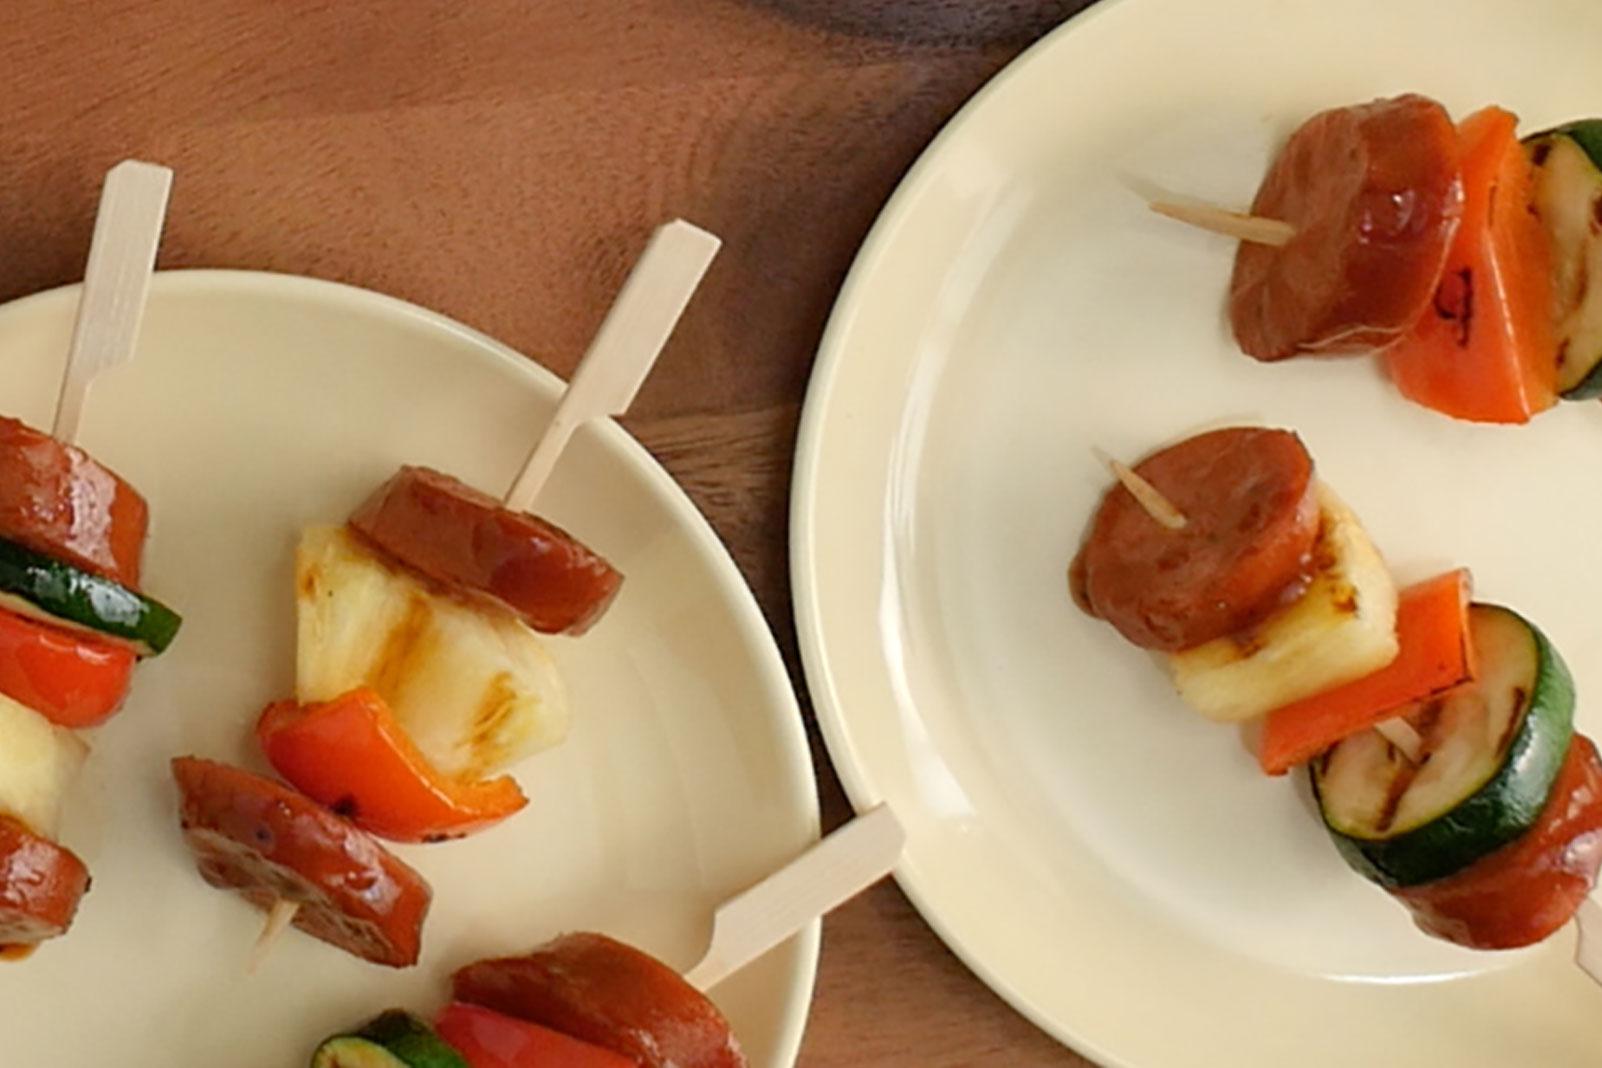 Cranberry Pineapple Glazed Kielbasa Bites